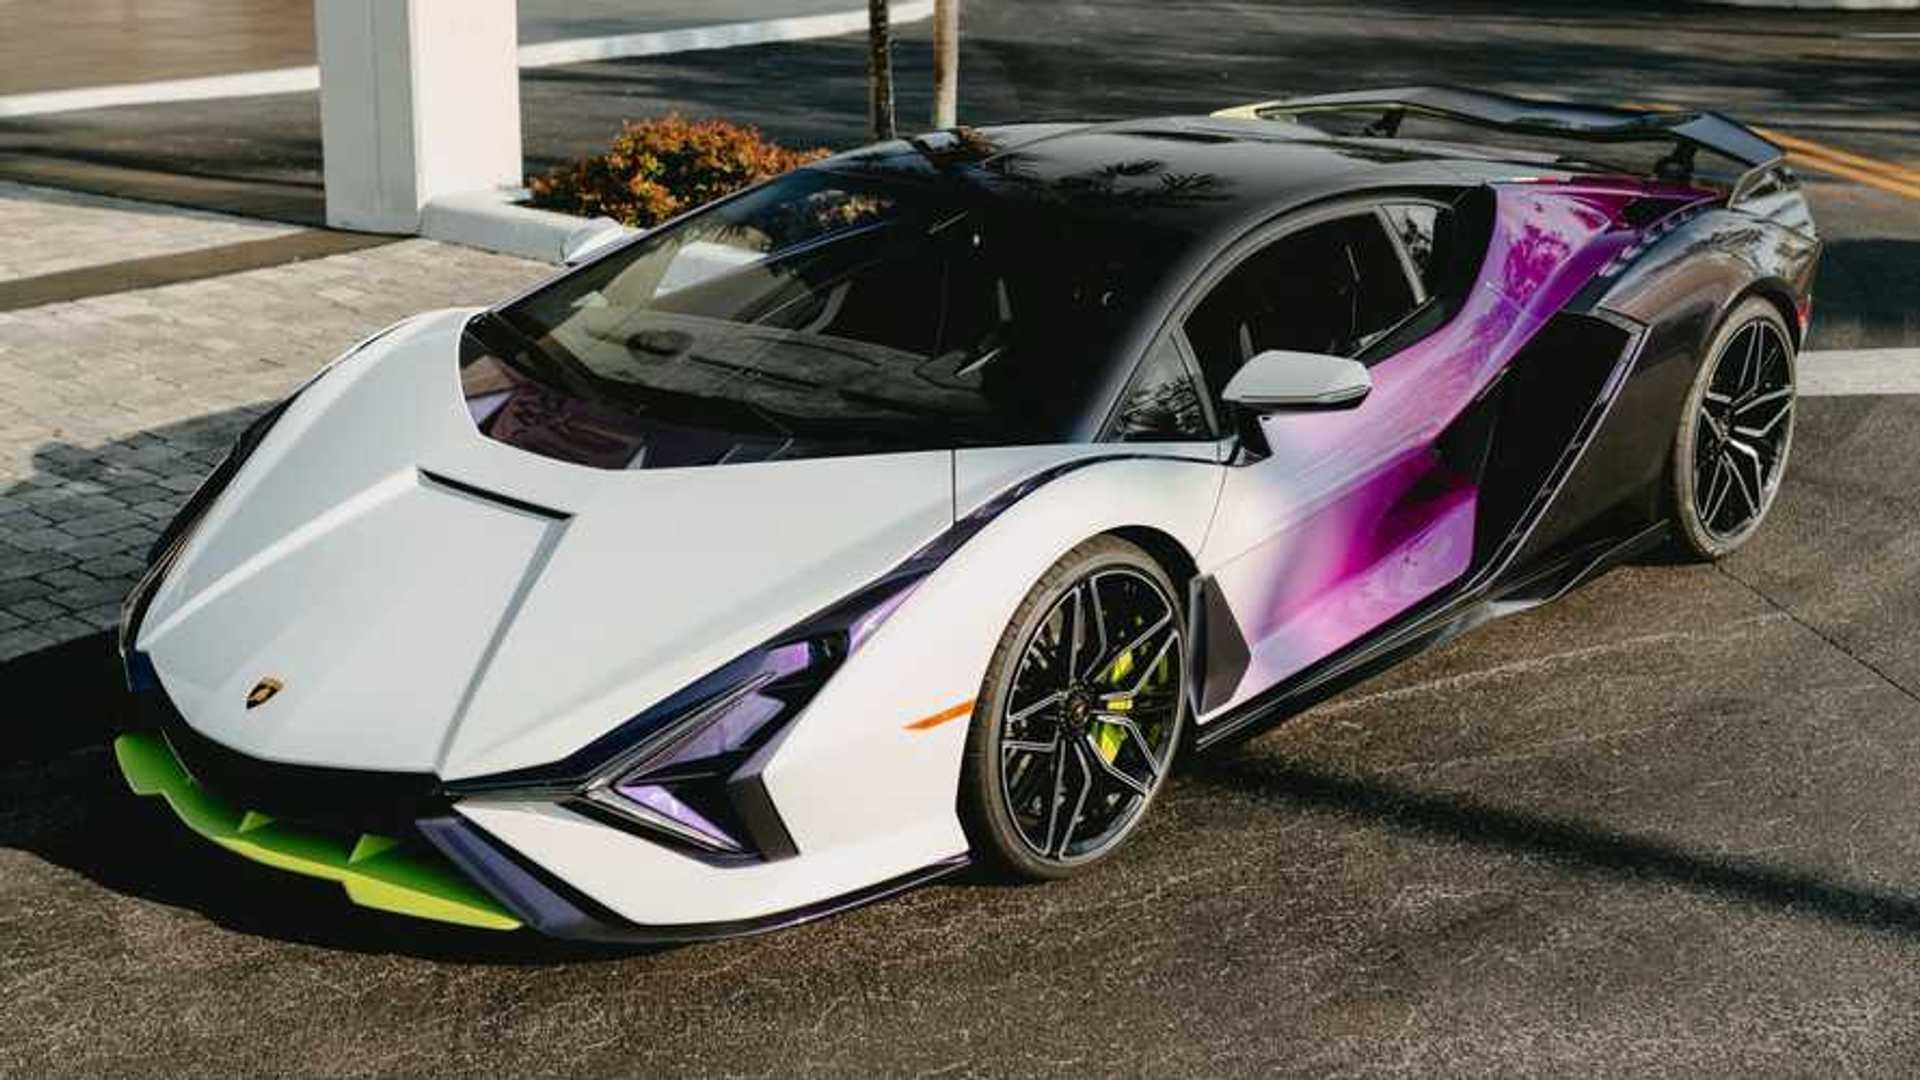 Lamborghini Sian In Purple, Green, And White Three Quarter Above Photo By Juan Pablo Saenz